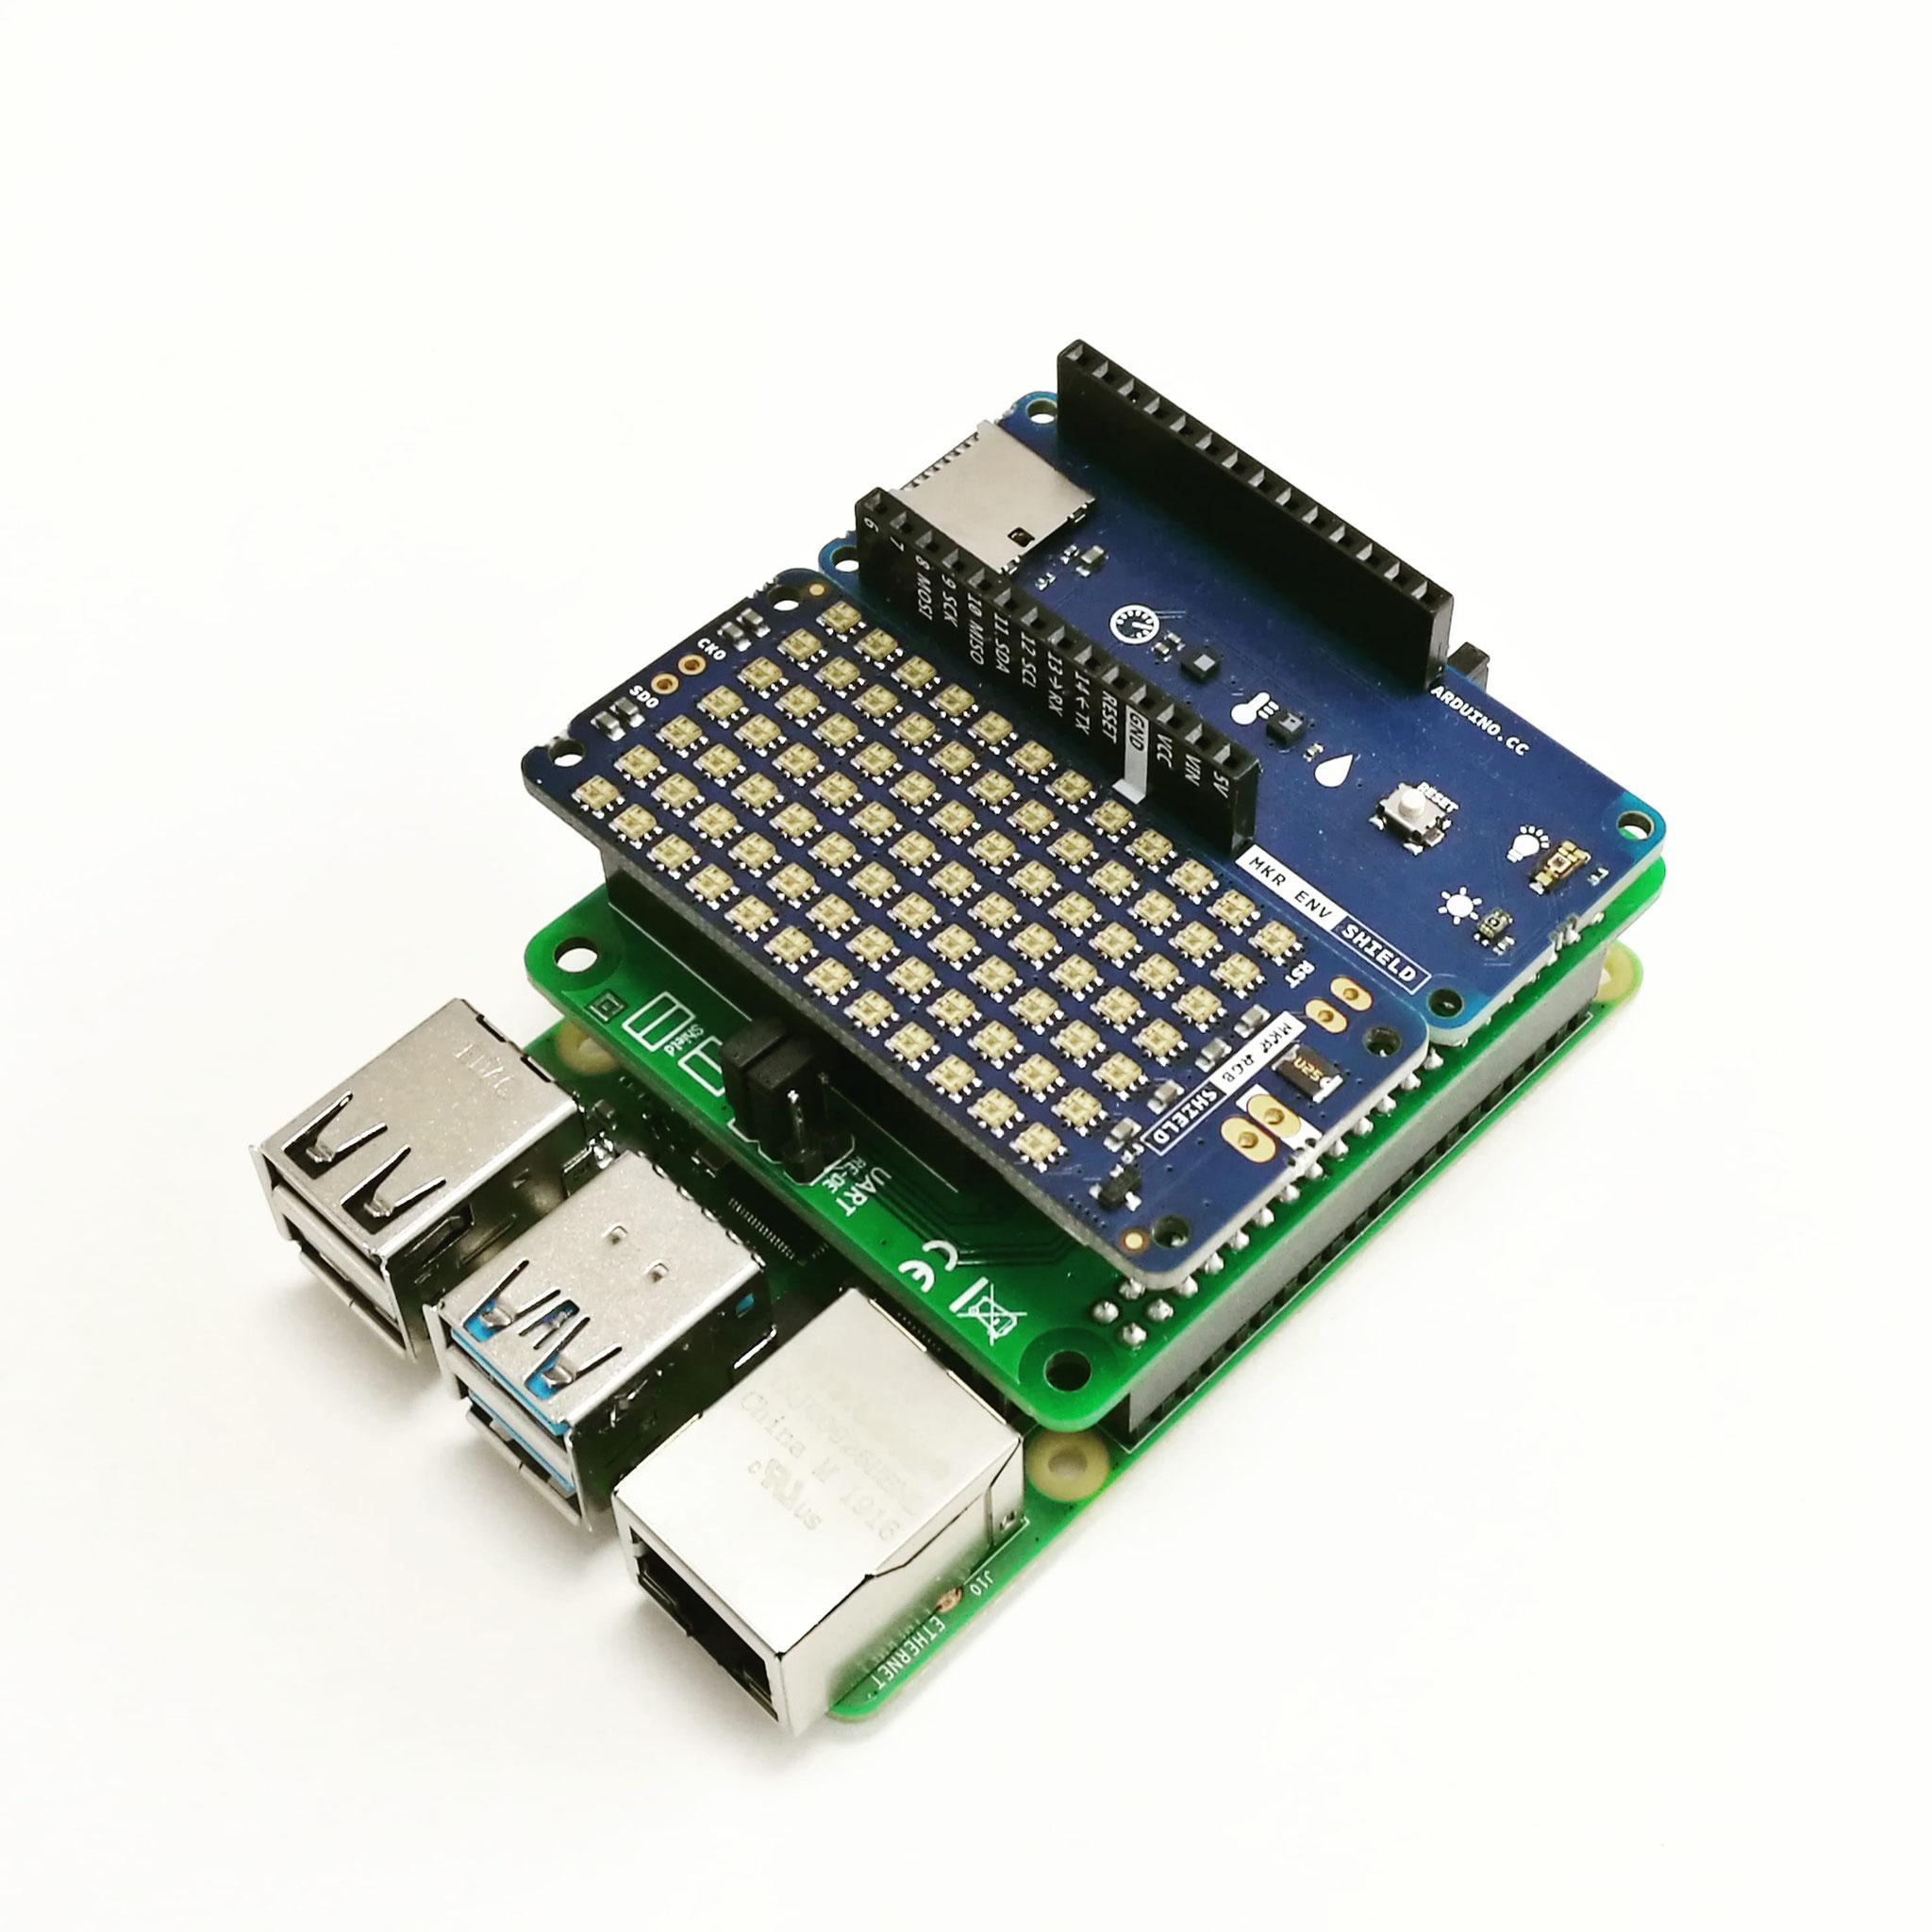 NEW: Raspberry HAT for adapting Arduino MKR shields